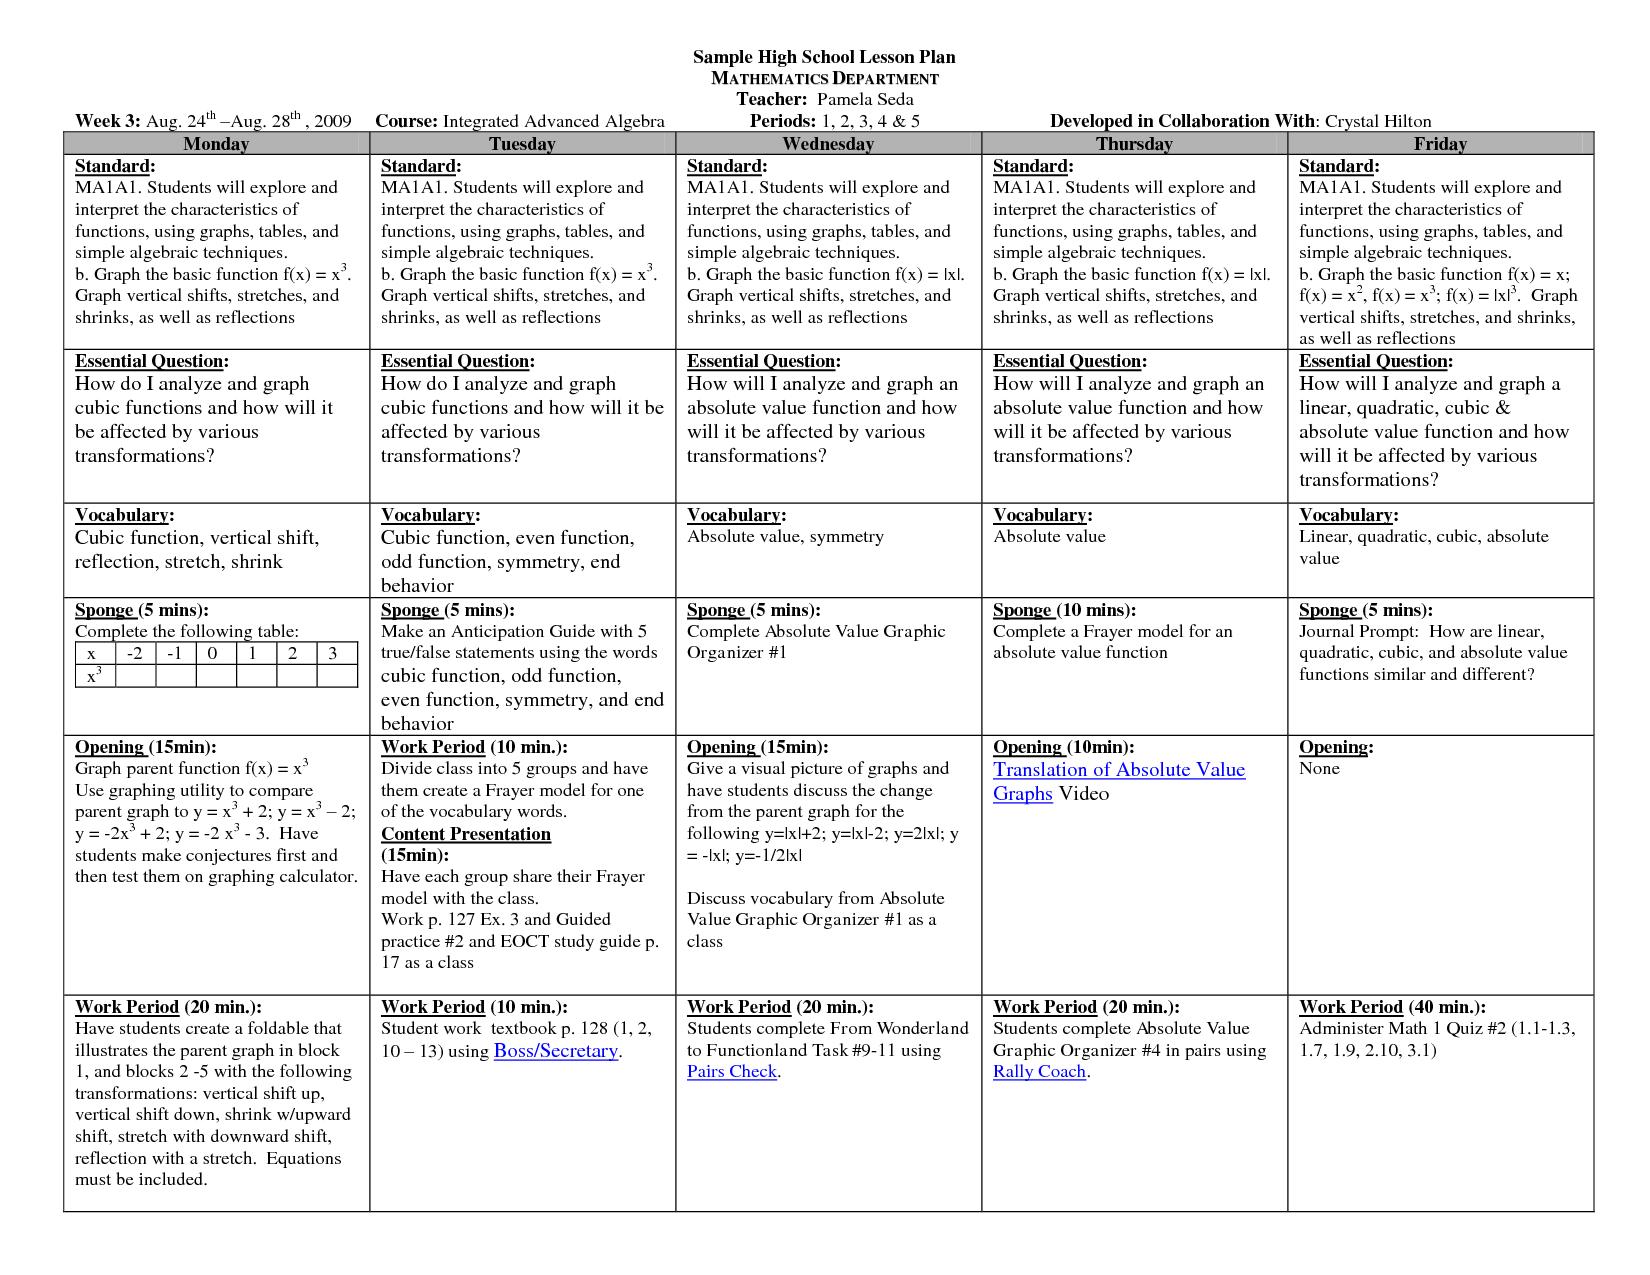 High School English Template # 1 | Teacherplanet.com